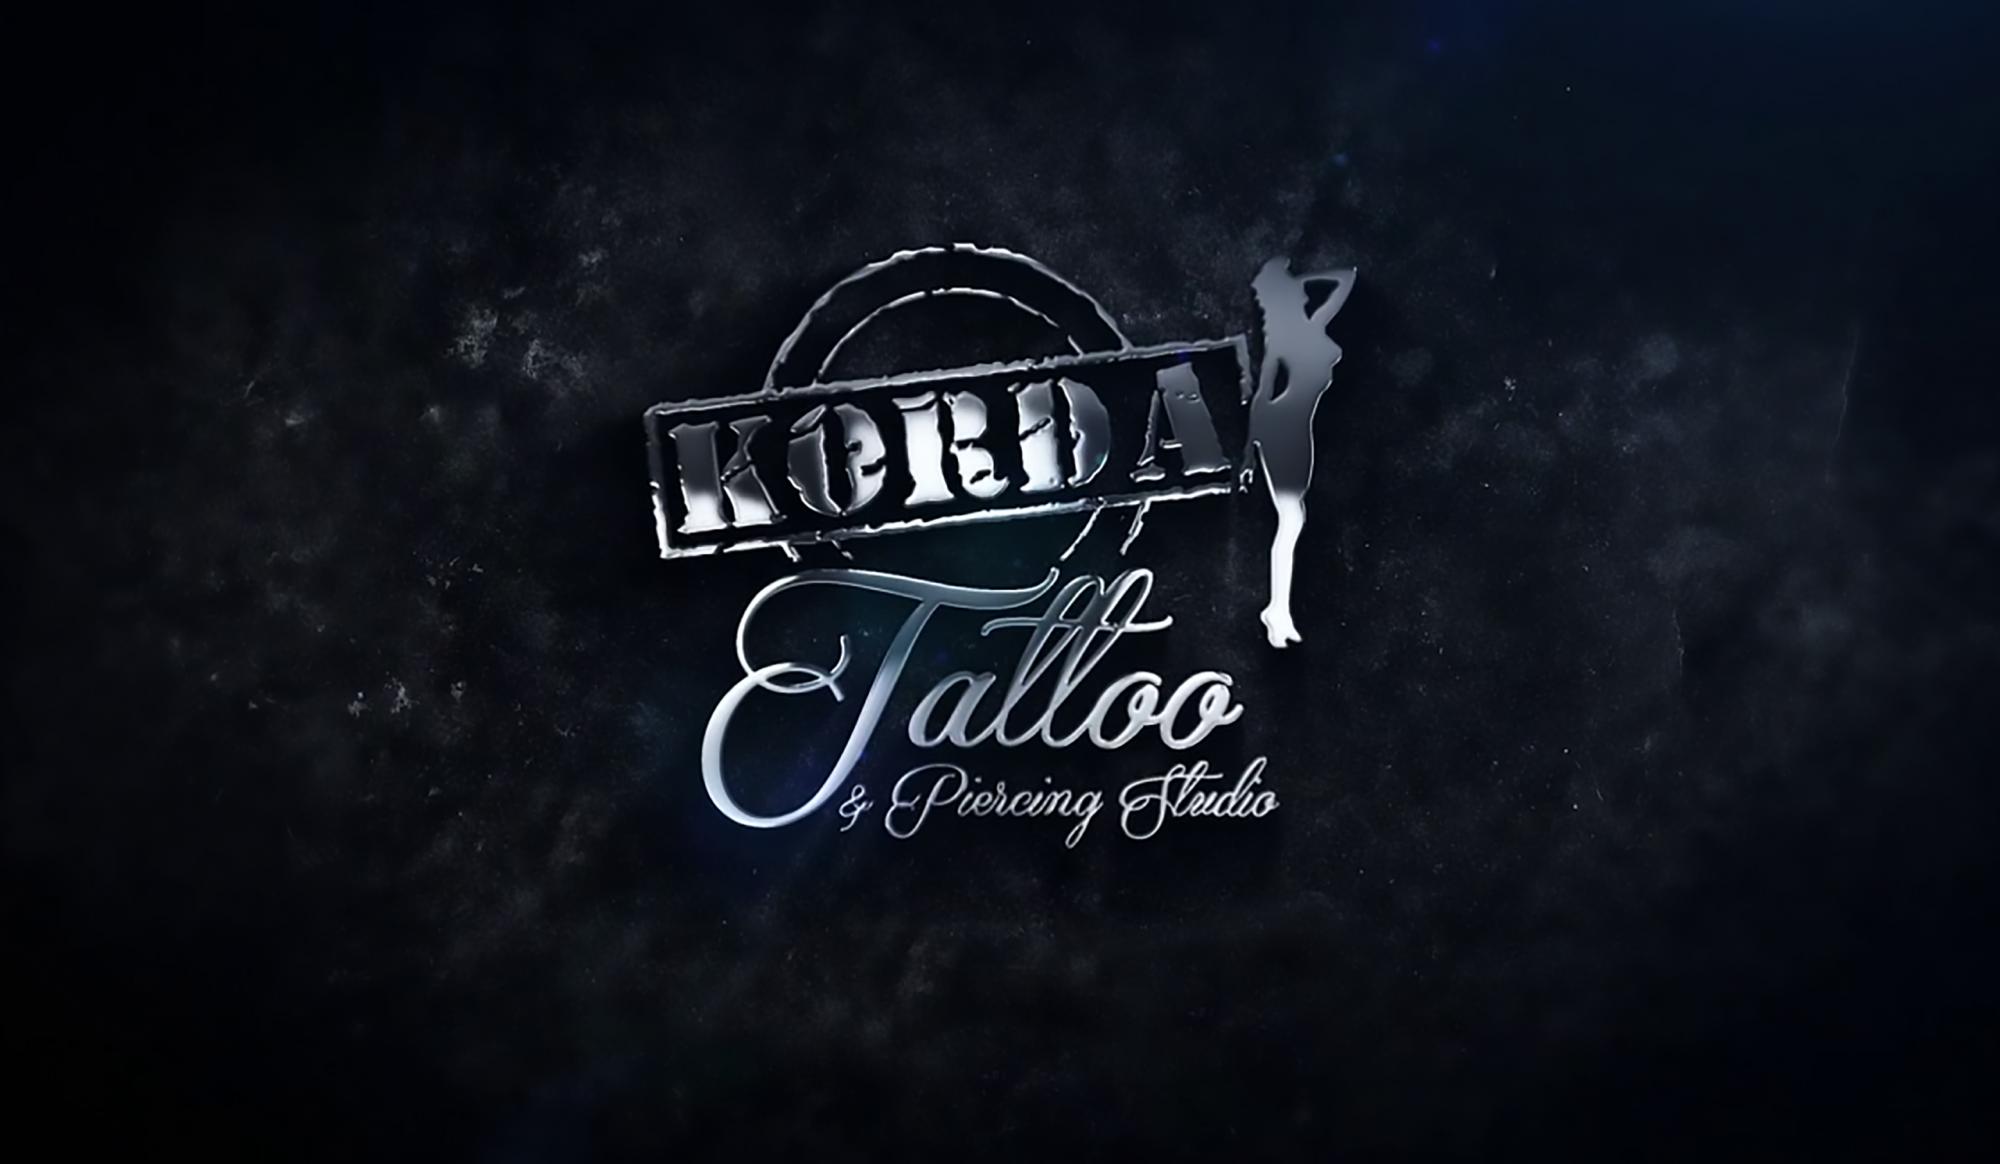 Korda Tattoo&Piercing Studio